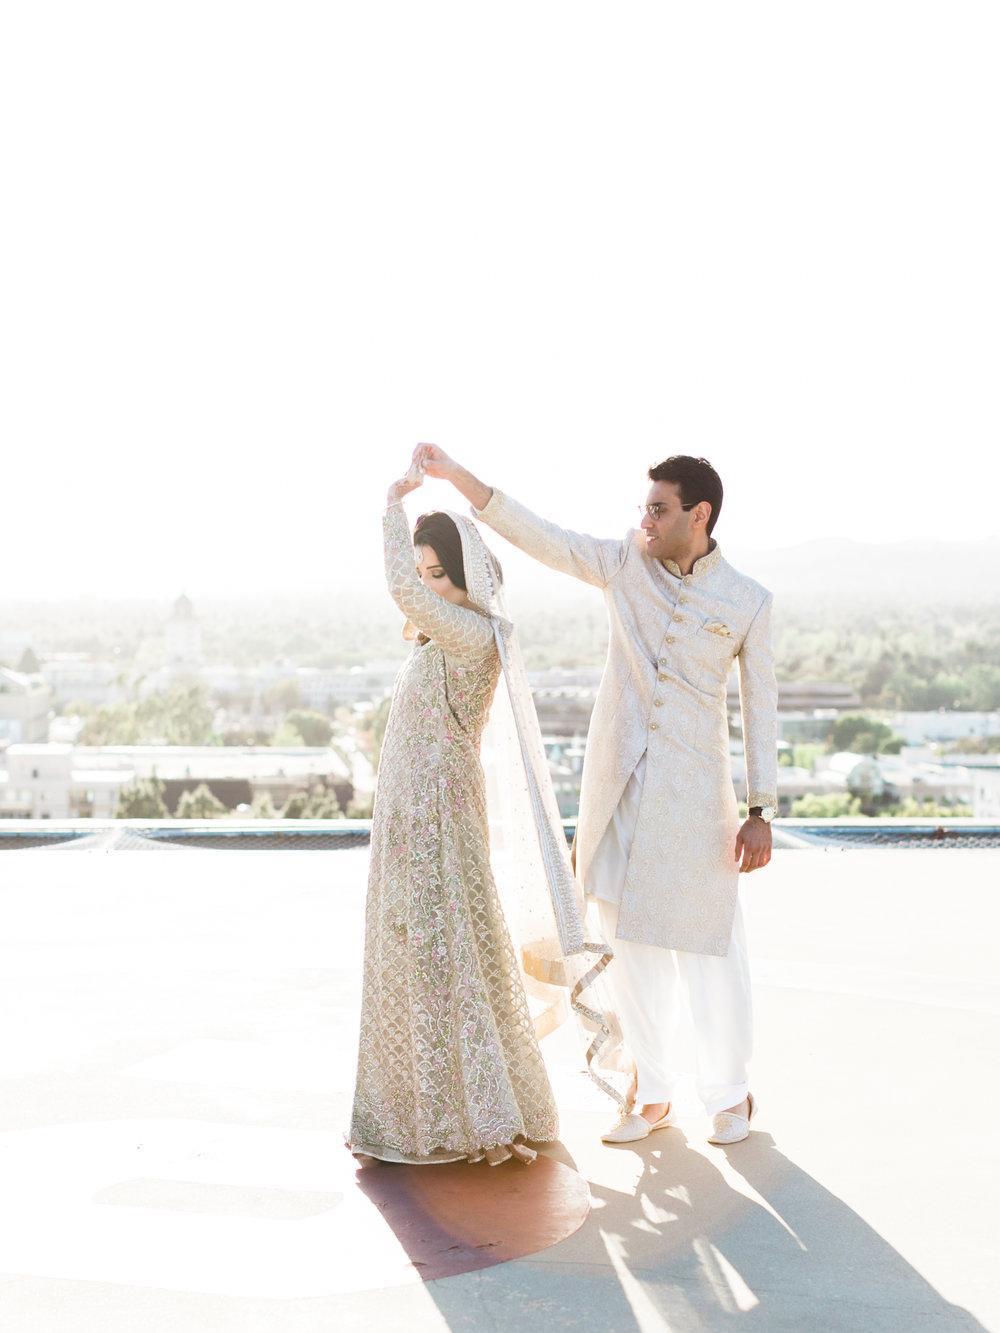 pakistani_kamal_beverly_hills_bride_bridal_faraz_manan_elan_sabysachi_traditional_fusion_bridal_beautiful_elegant_sabaa_kamal_styled_by_kamal_brides.jpg